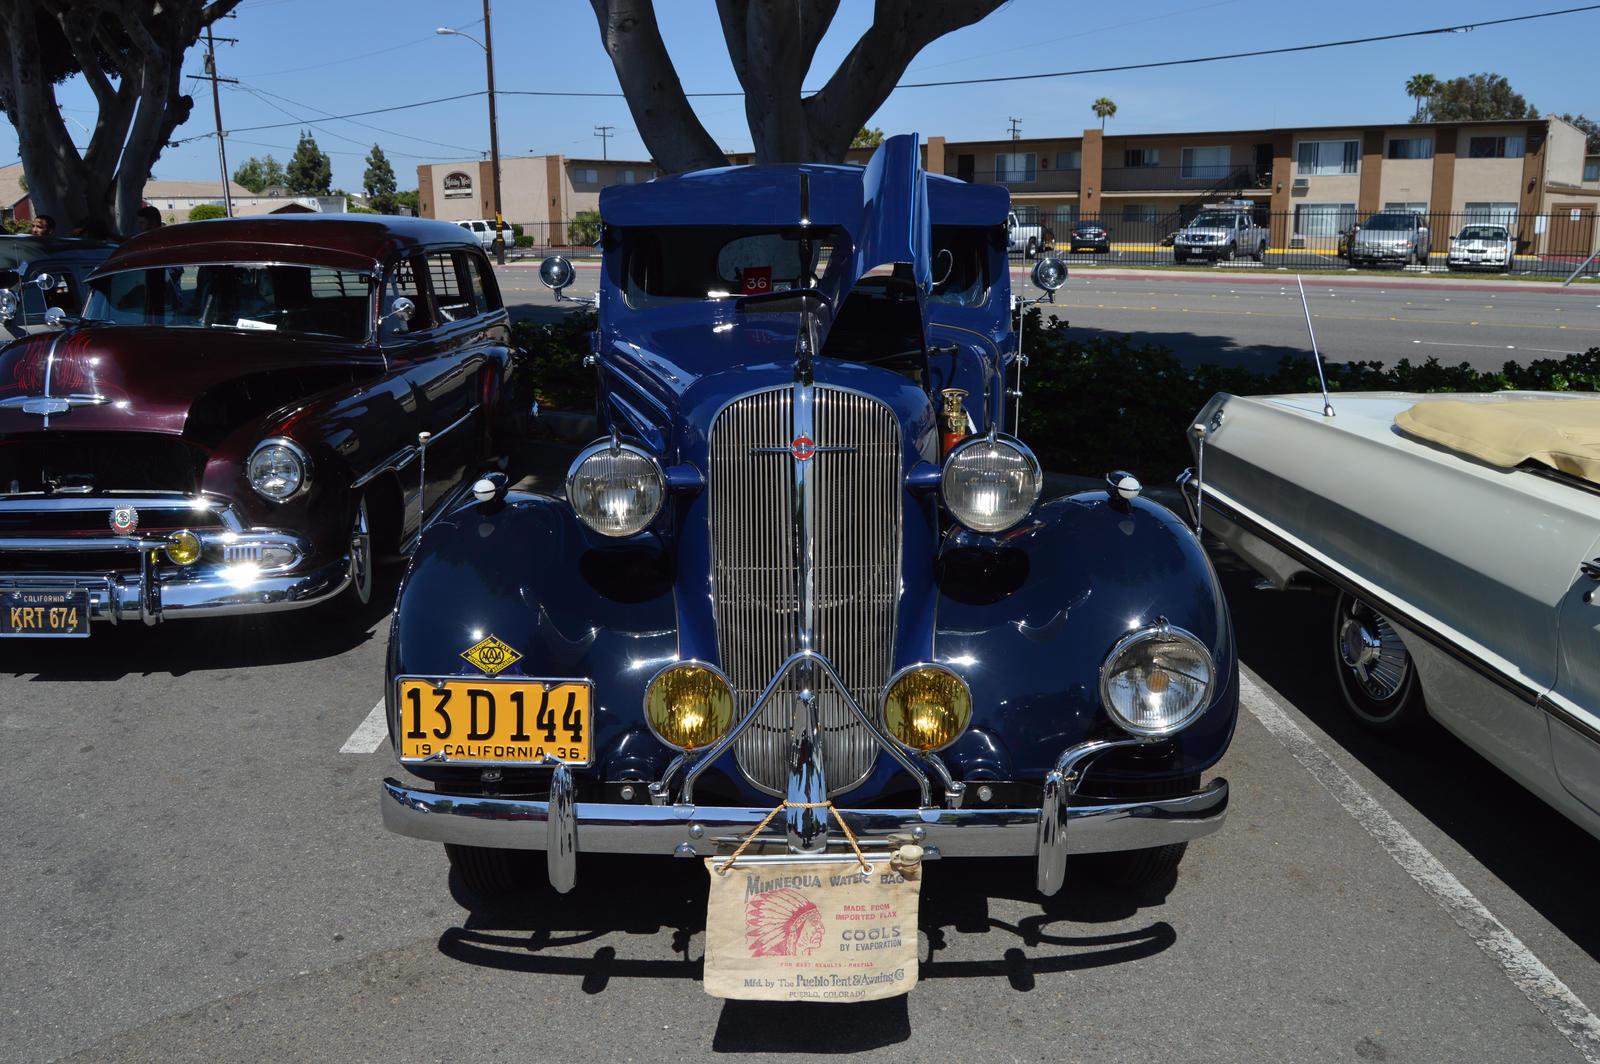 1936 chevrolet four door sedan ii by brooklyn47 on deviantart for 1936 chevy 4 door sedan